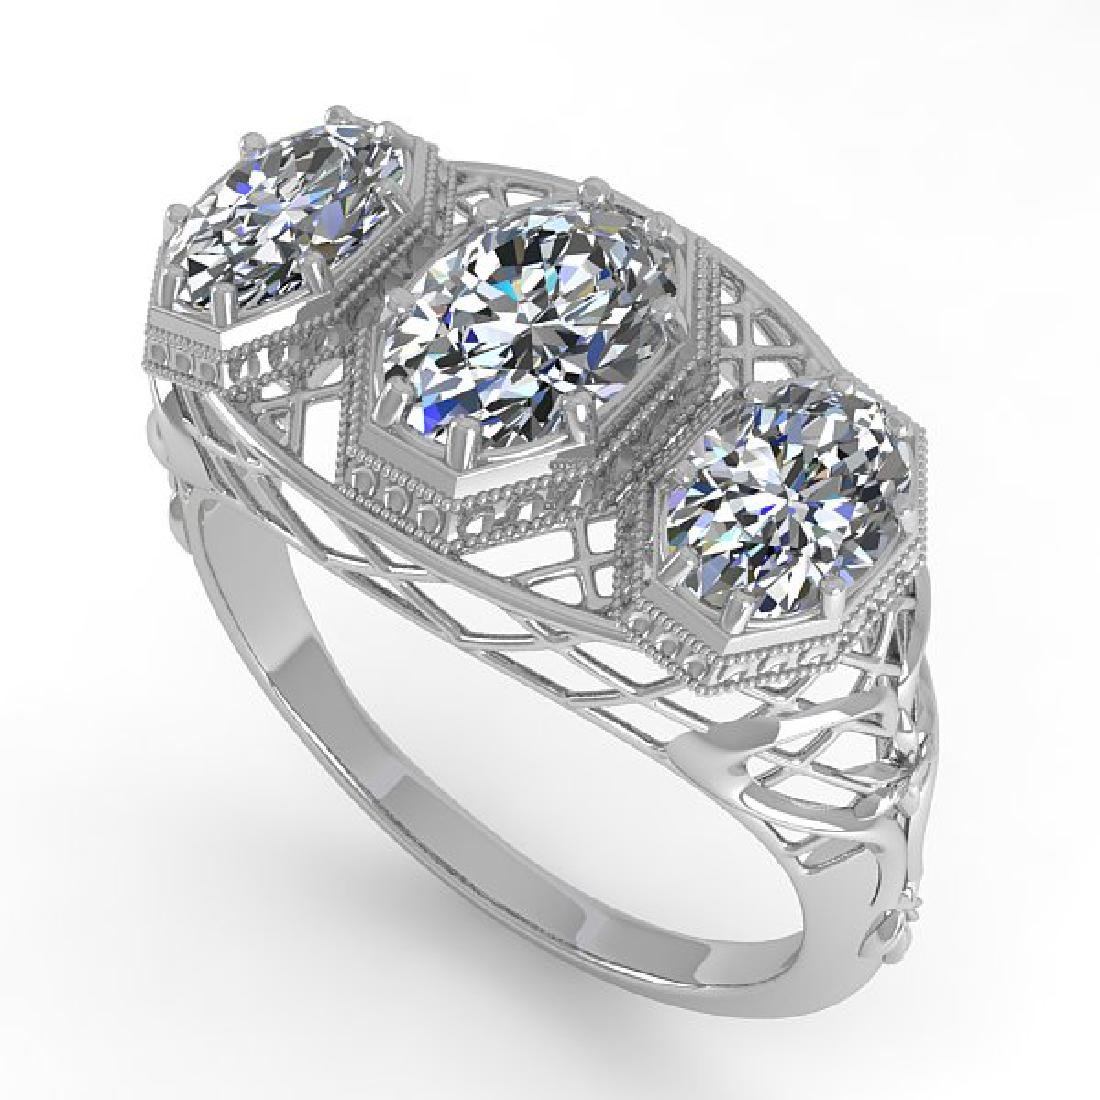 2 CTW VS/SI Oval Cut Diamond Ring 14K White Gold - 2